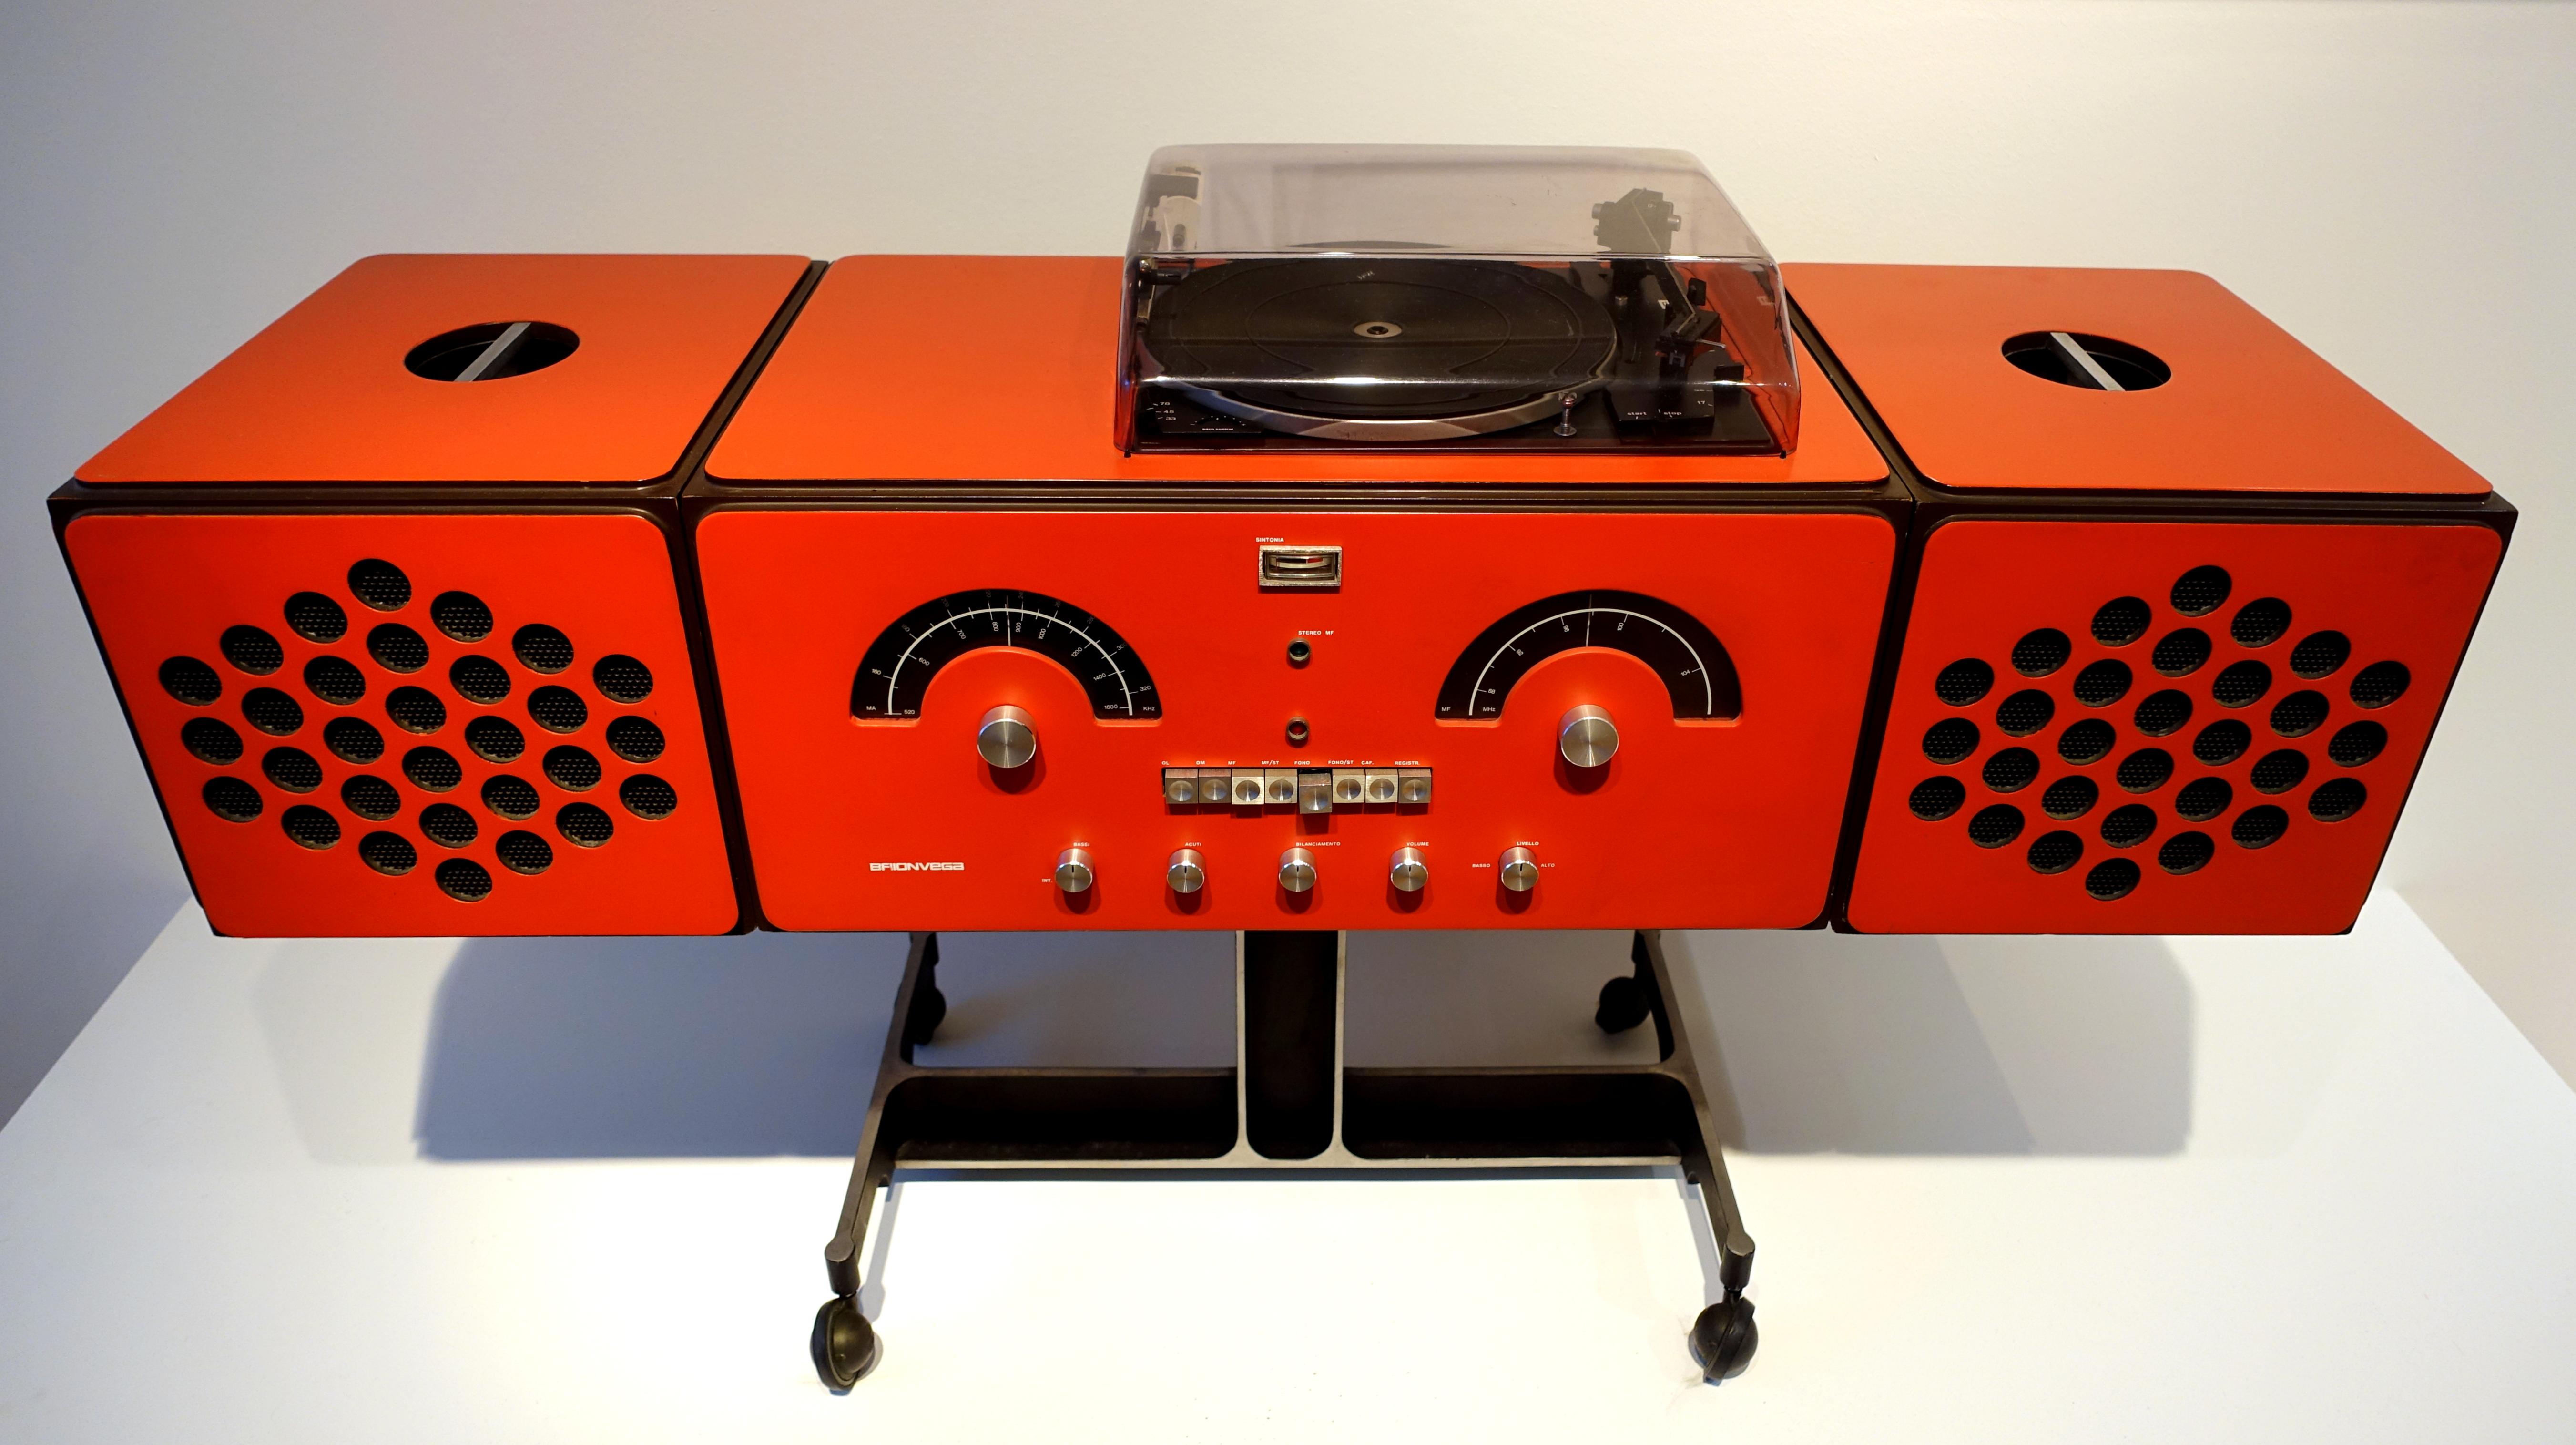 File:Stereo system, Model RR-126-OF-ST, Deposito, designed by Achille Castiglioni, Brionvega, Milan, lacquered wood - Museum für Angewandte Kunst Köln - Cologne, Germany - DSC09671.jpg